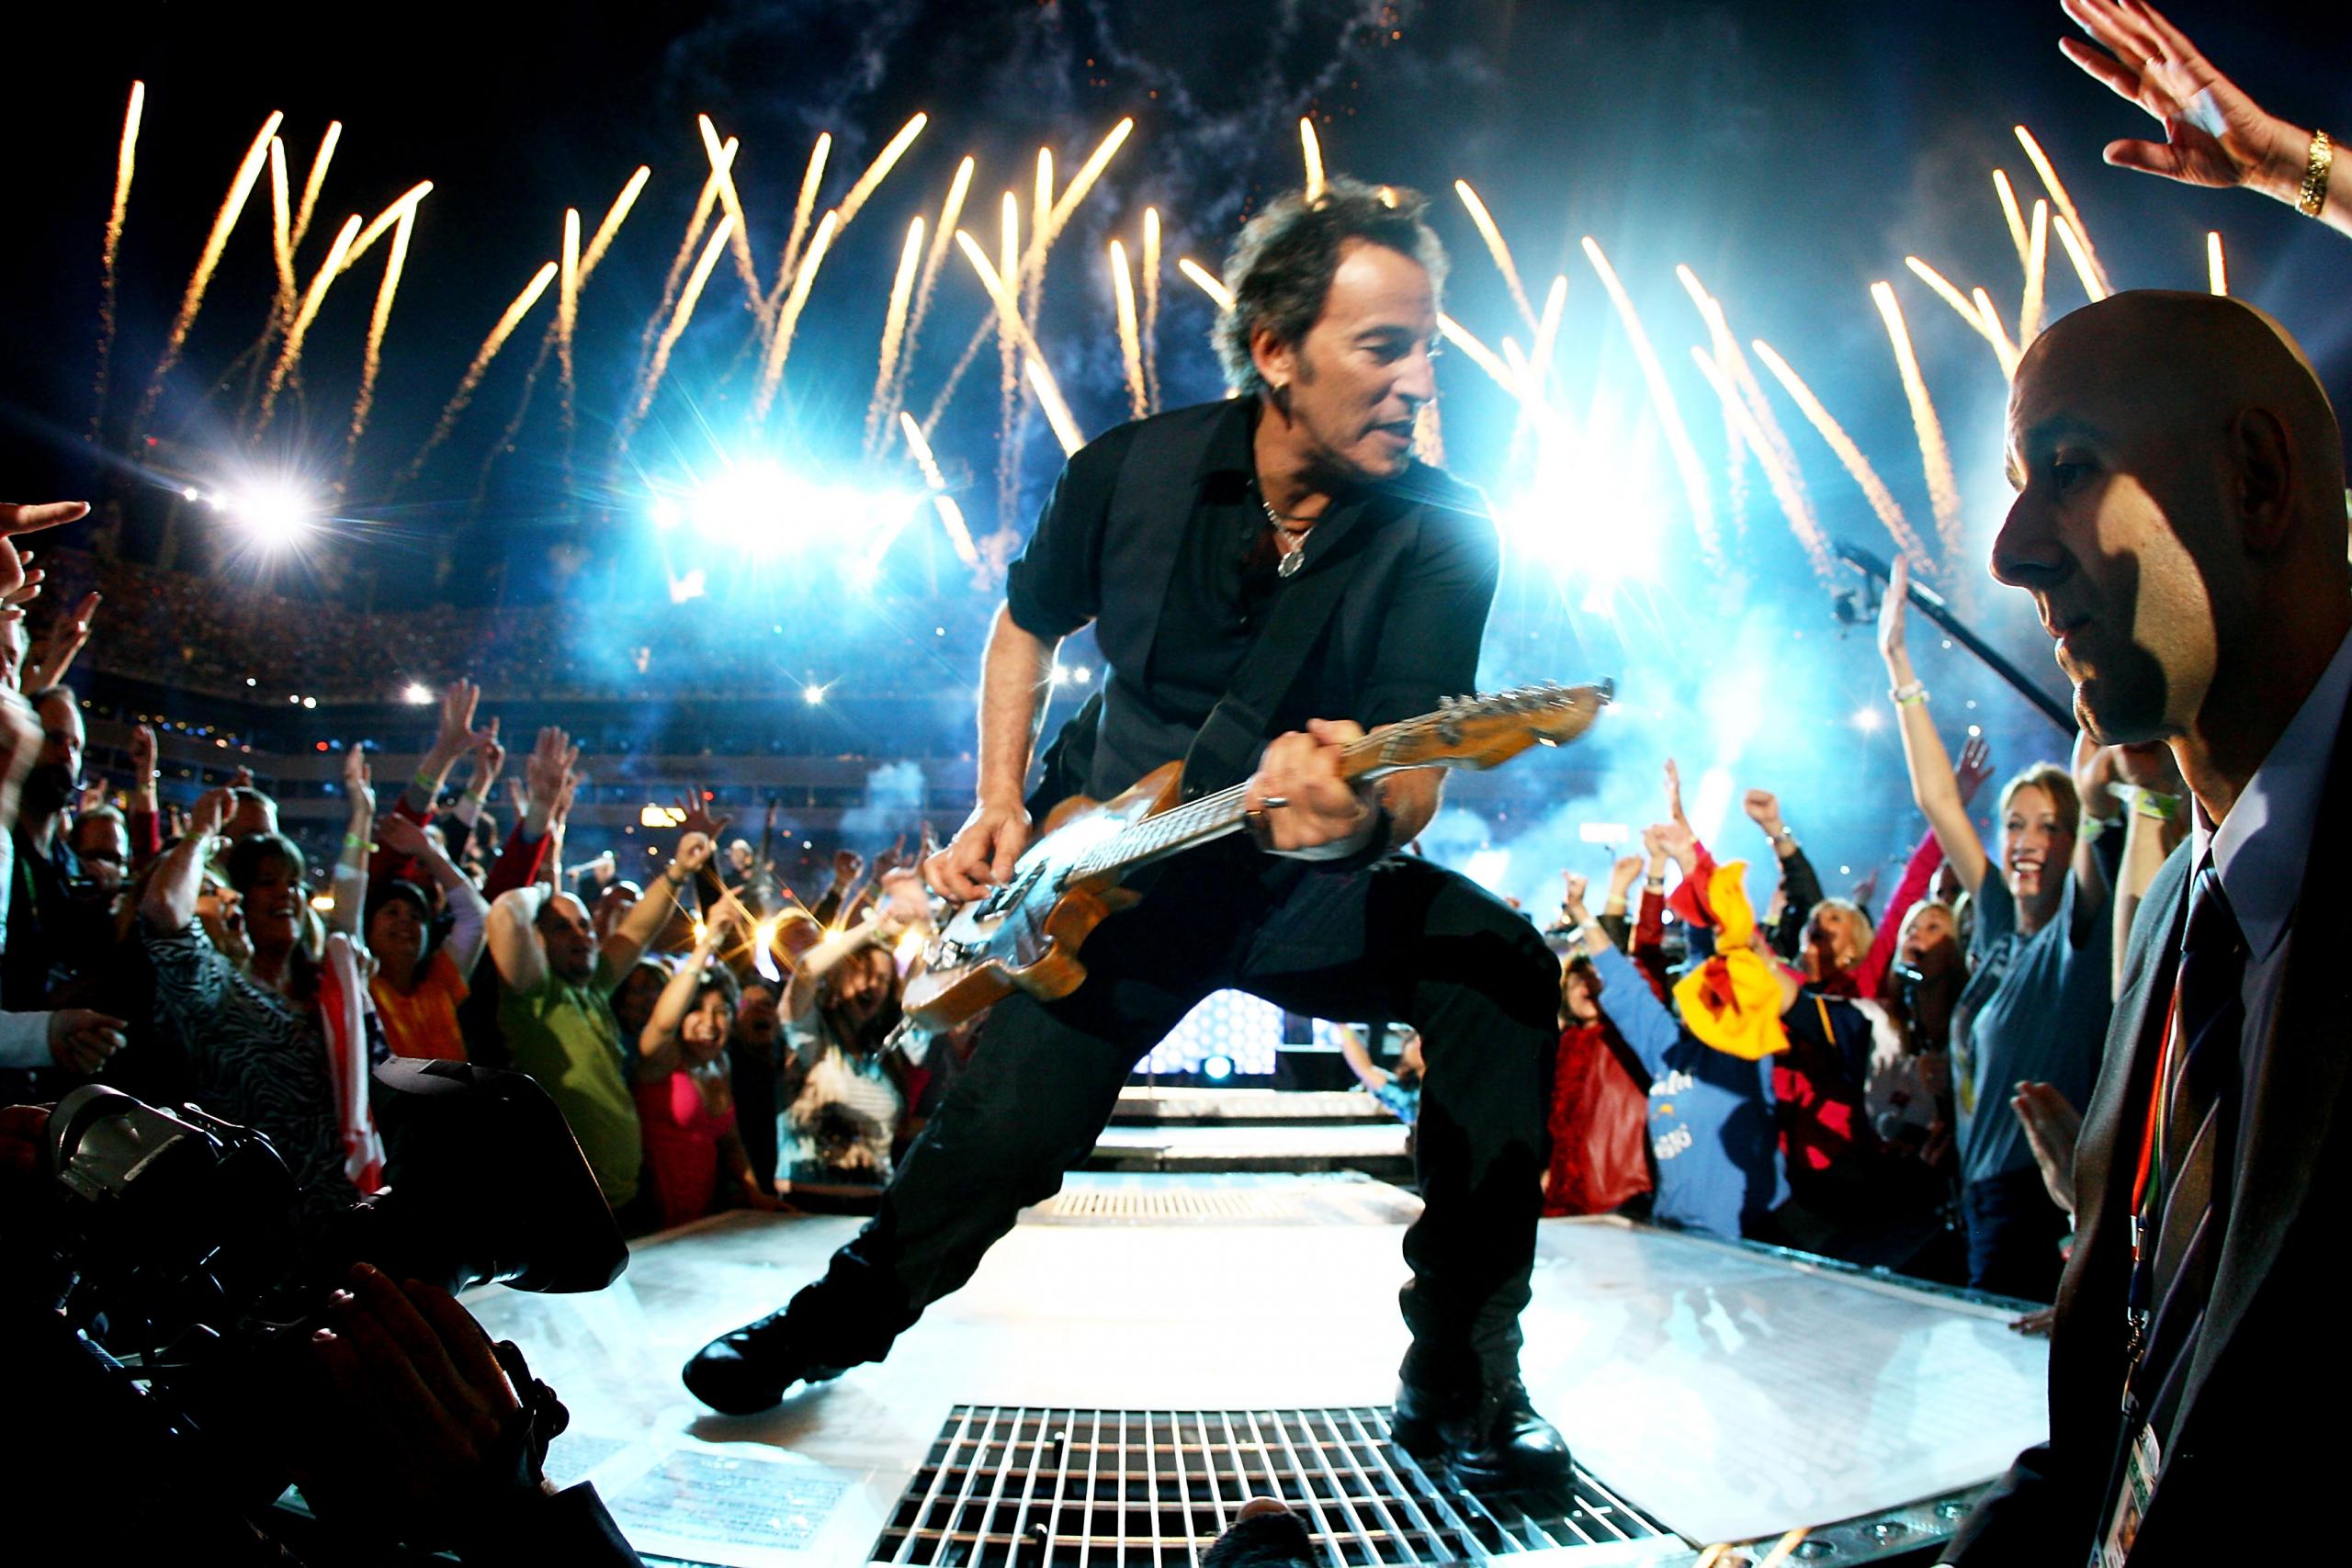 Legendary 1979 Bruce Springsteen Concert To Be Released This November